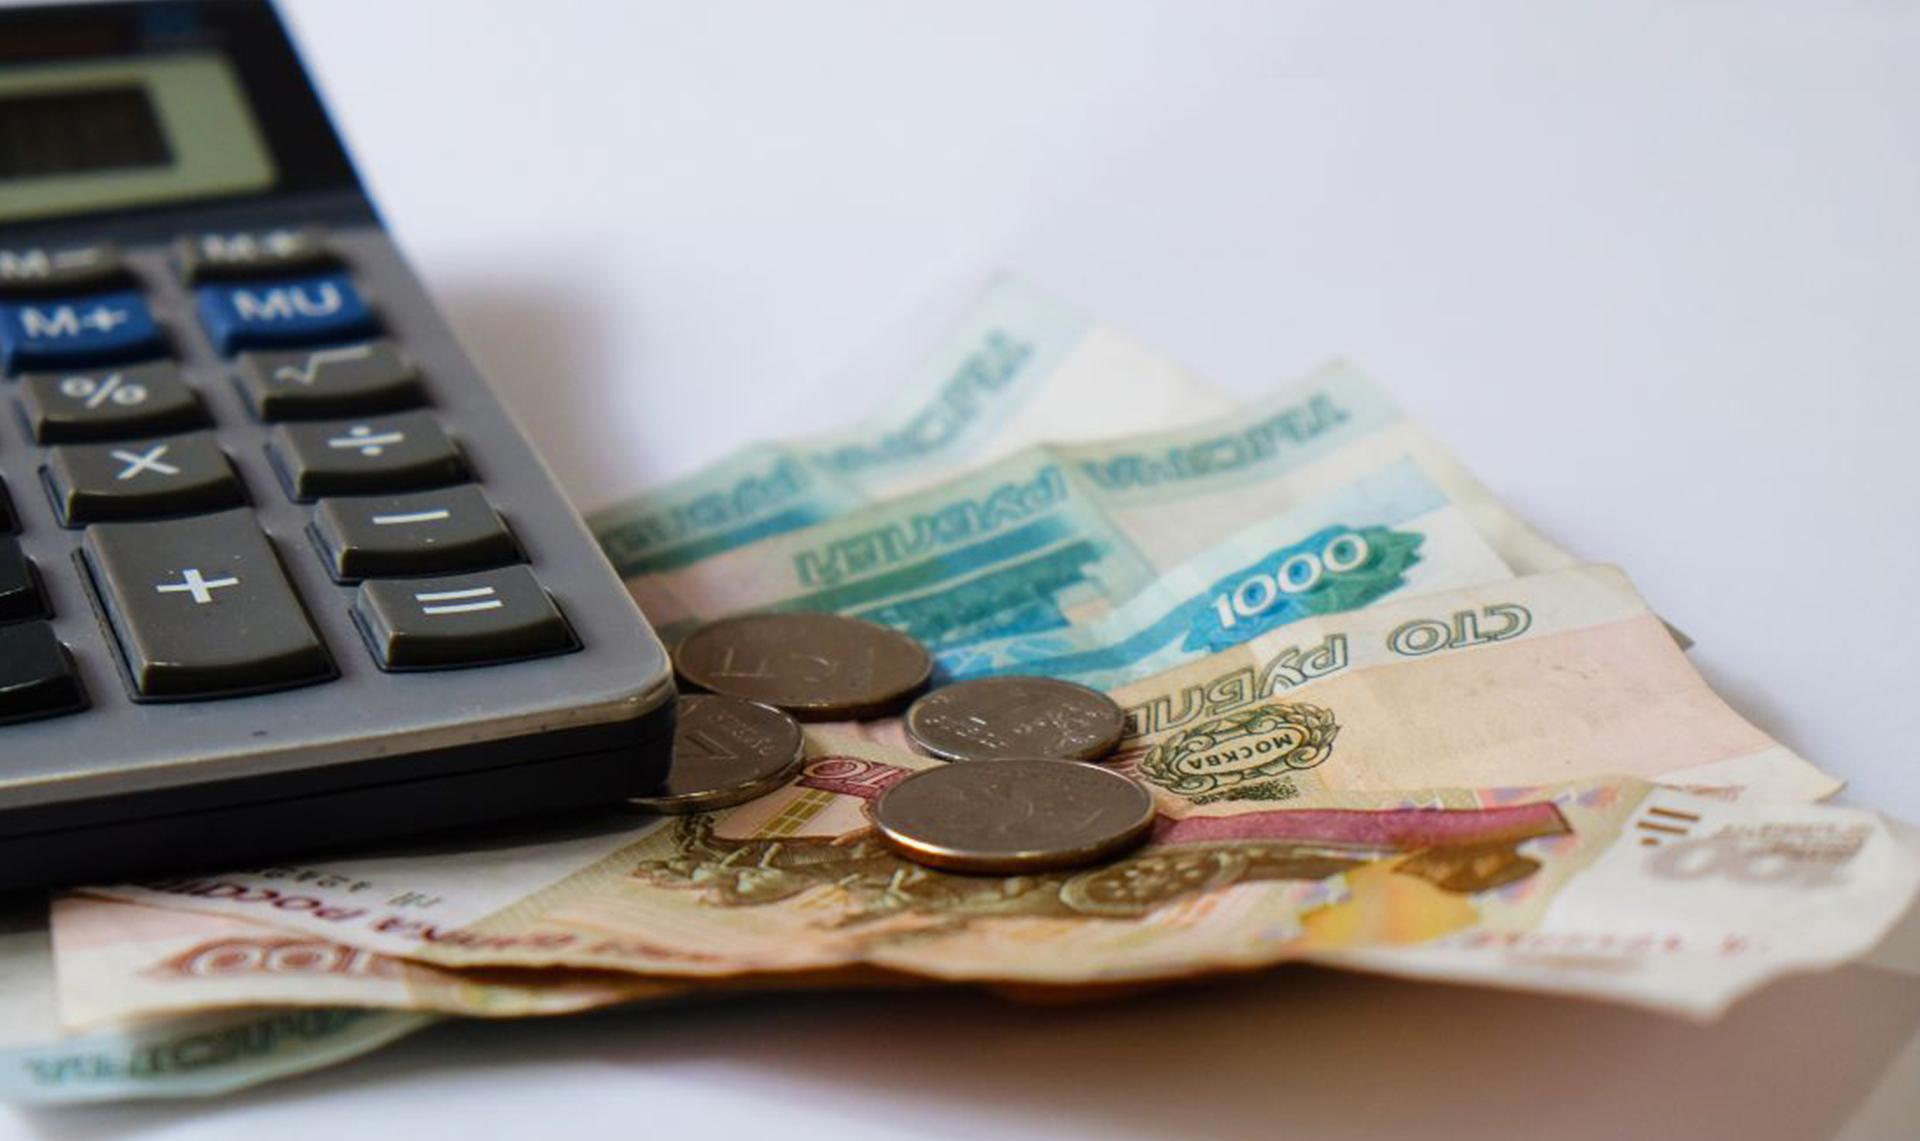 Субсидия на оплату ЖКХ